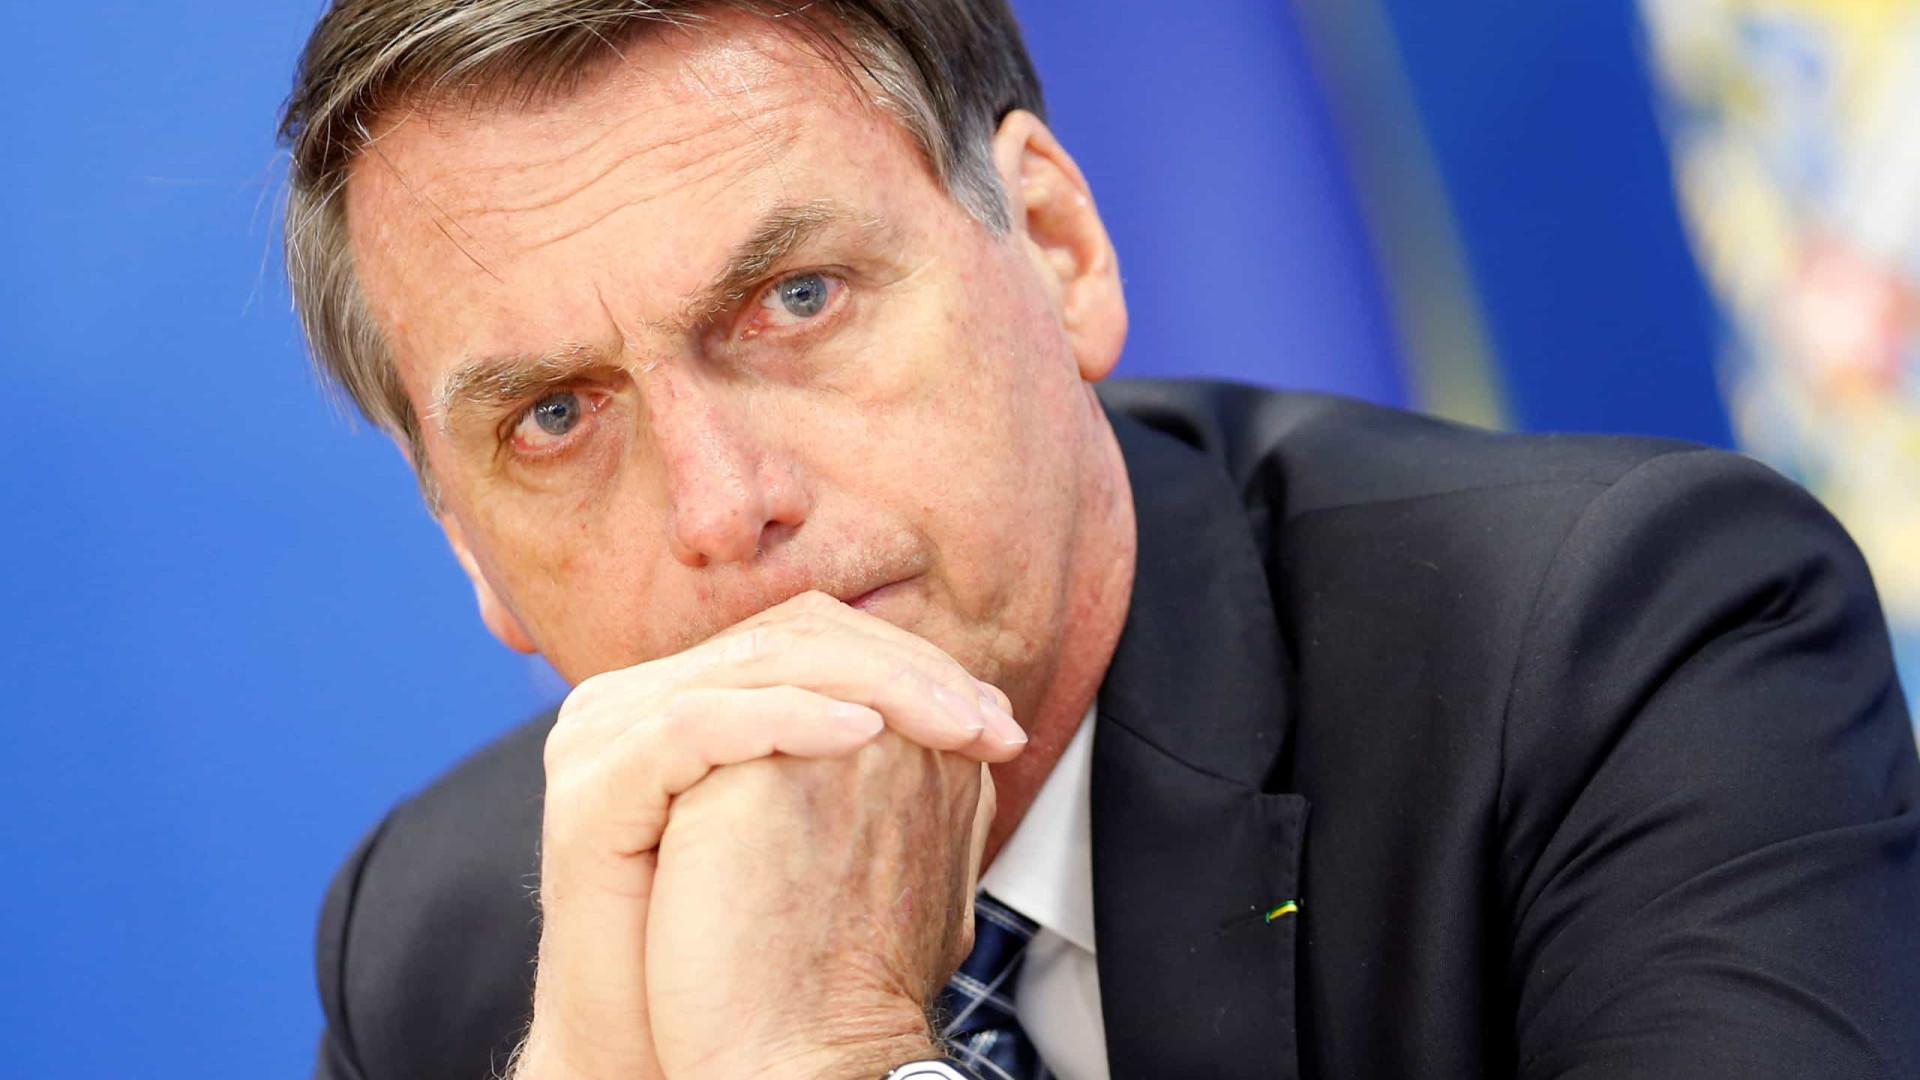 Bolsonaro diz estranhar suposto silêncio de ONGs sobre manchas de óleo